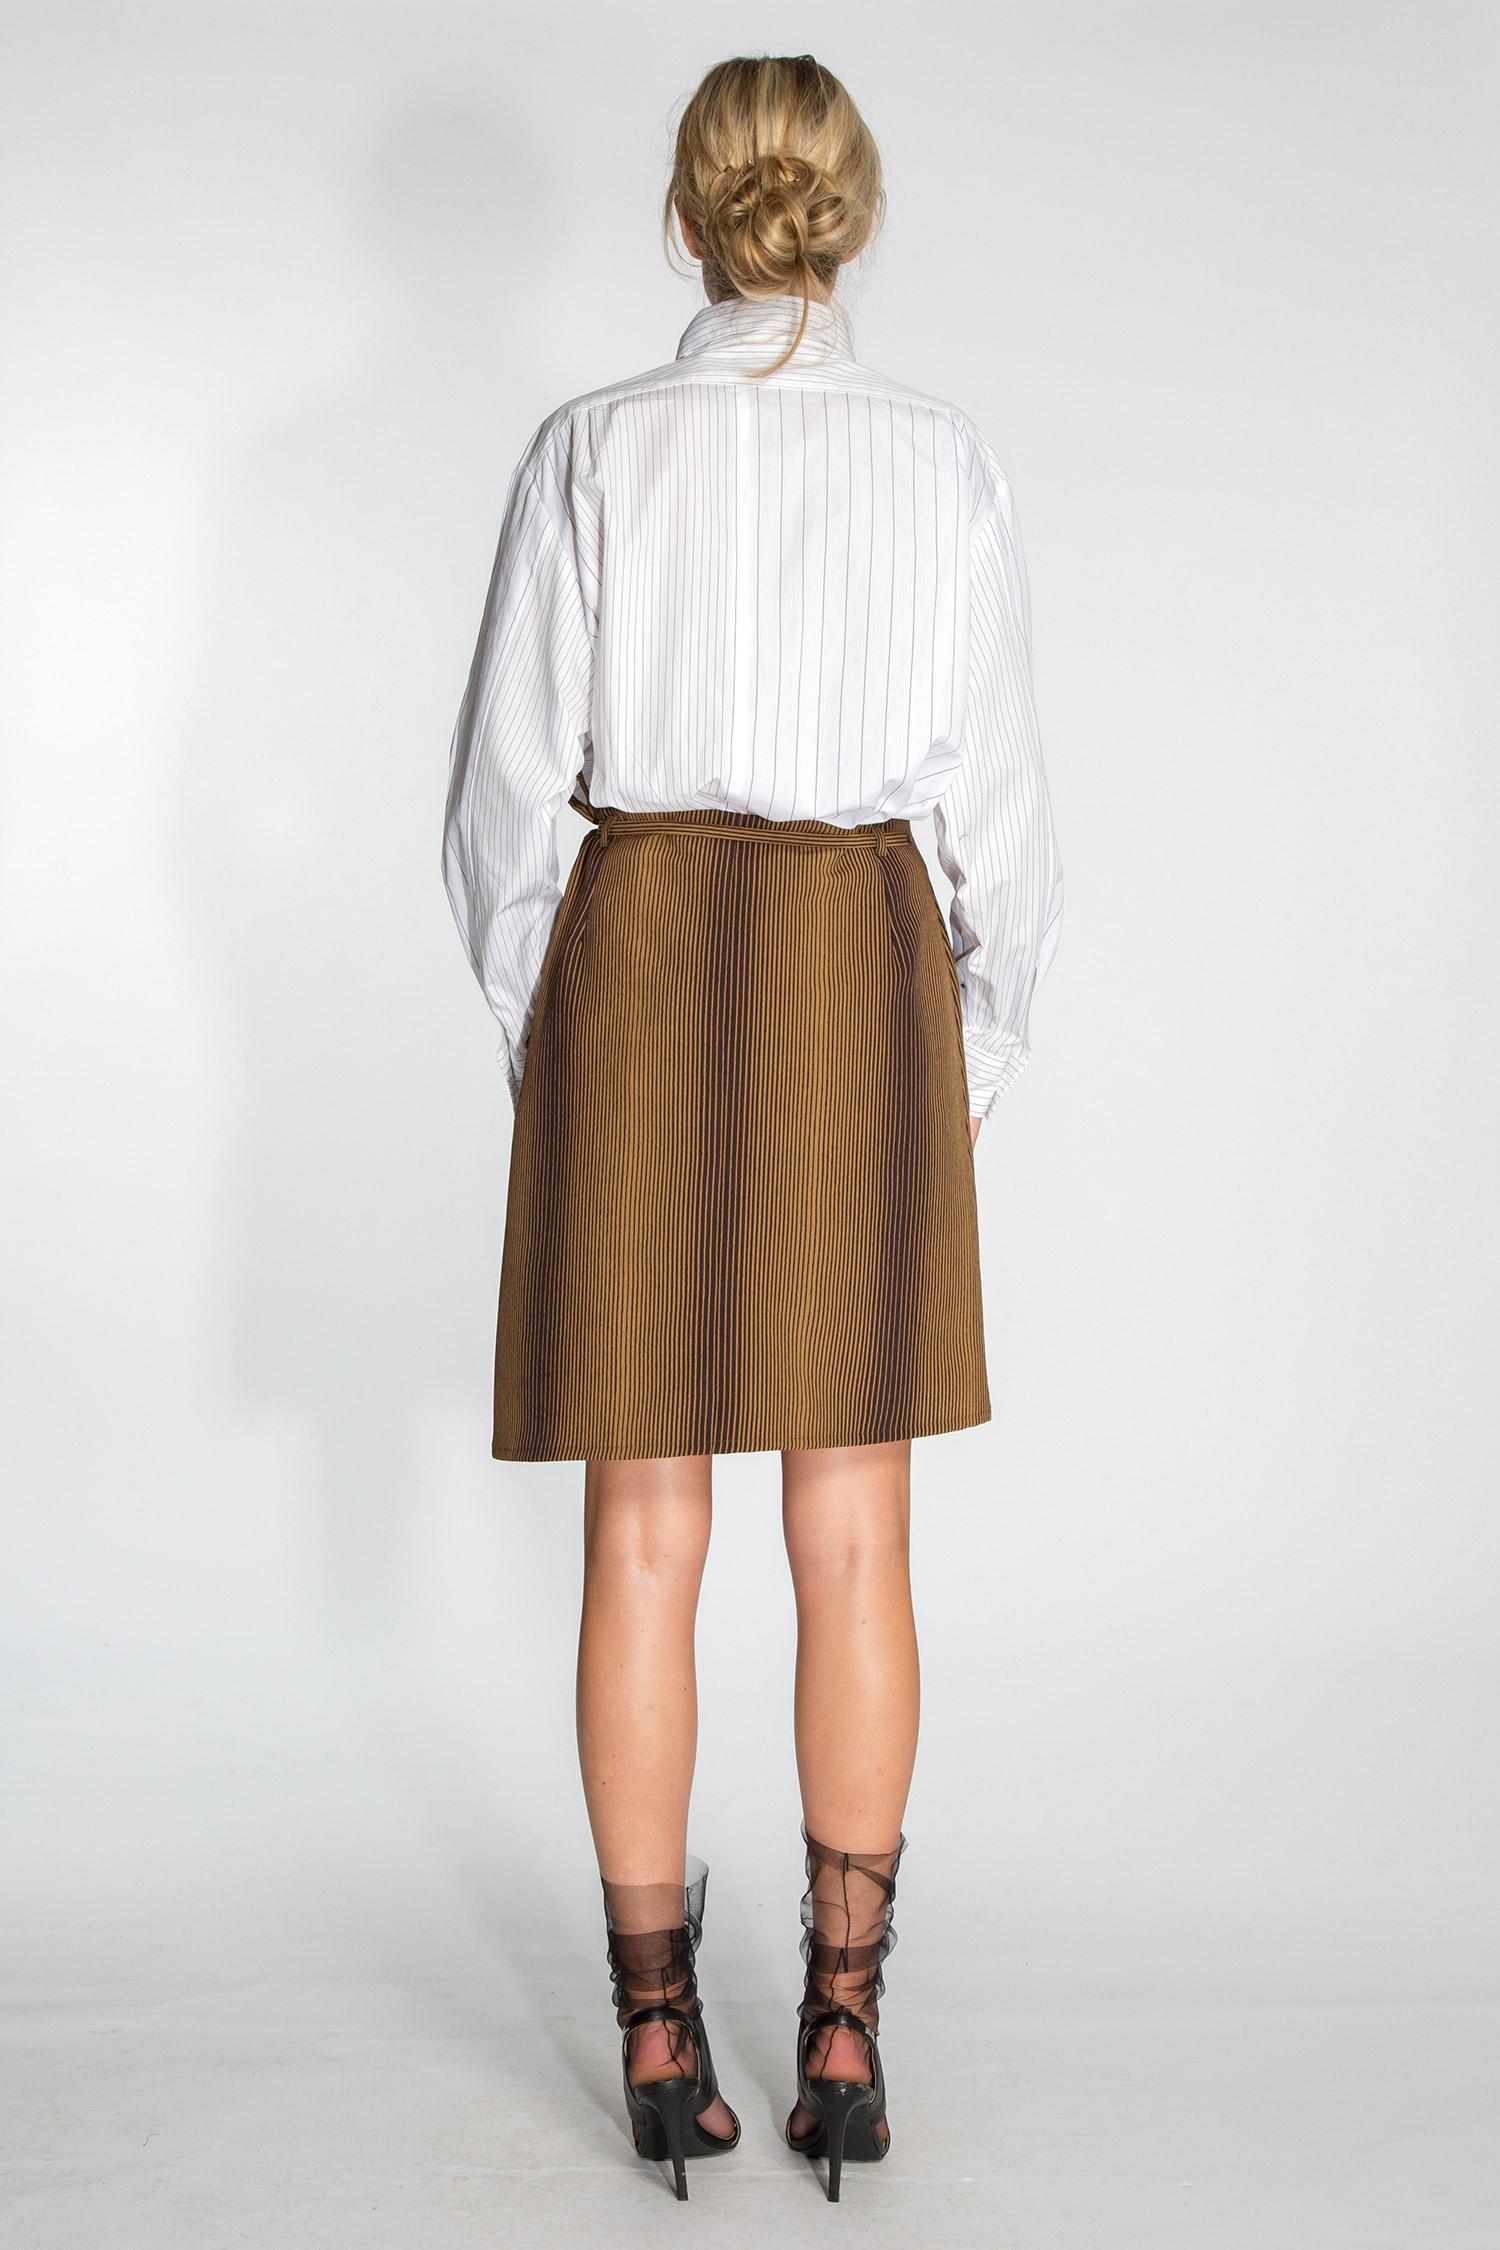 18.8.31-Asiatica-Clothing-Shoot-Lillie-725.jpg